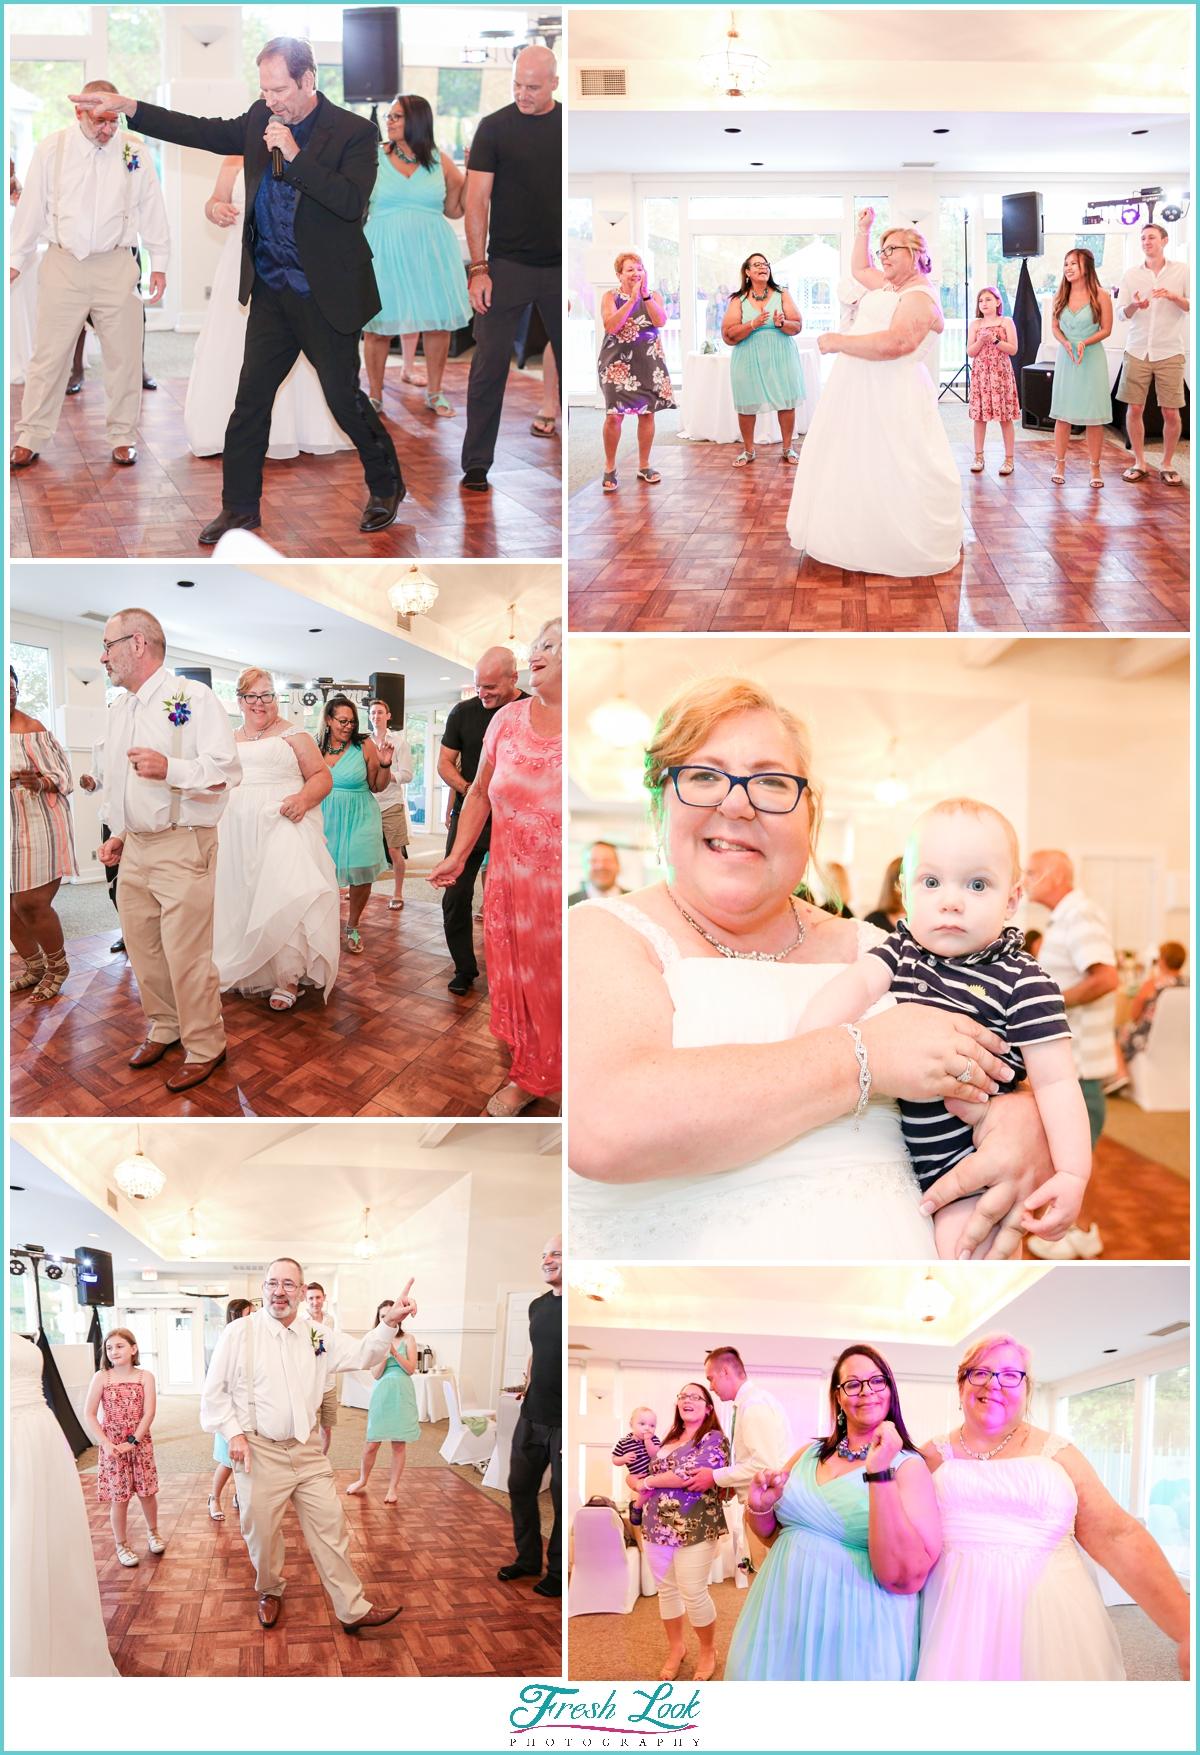 wedding reception fun in Chesapeake